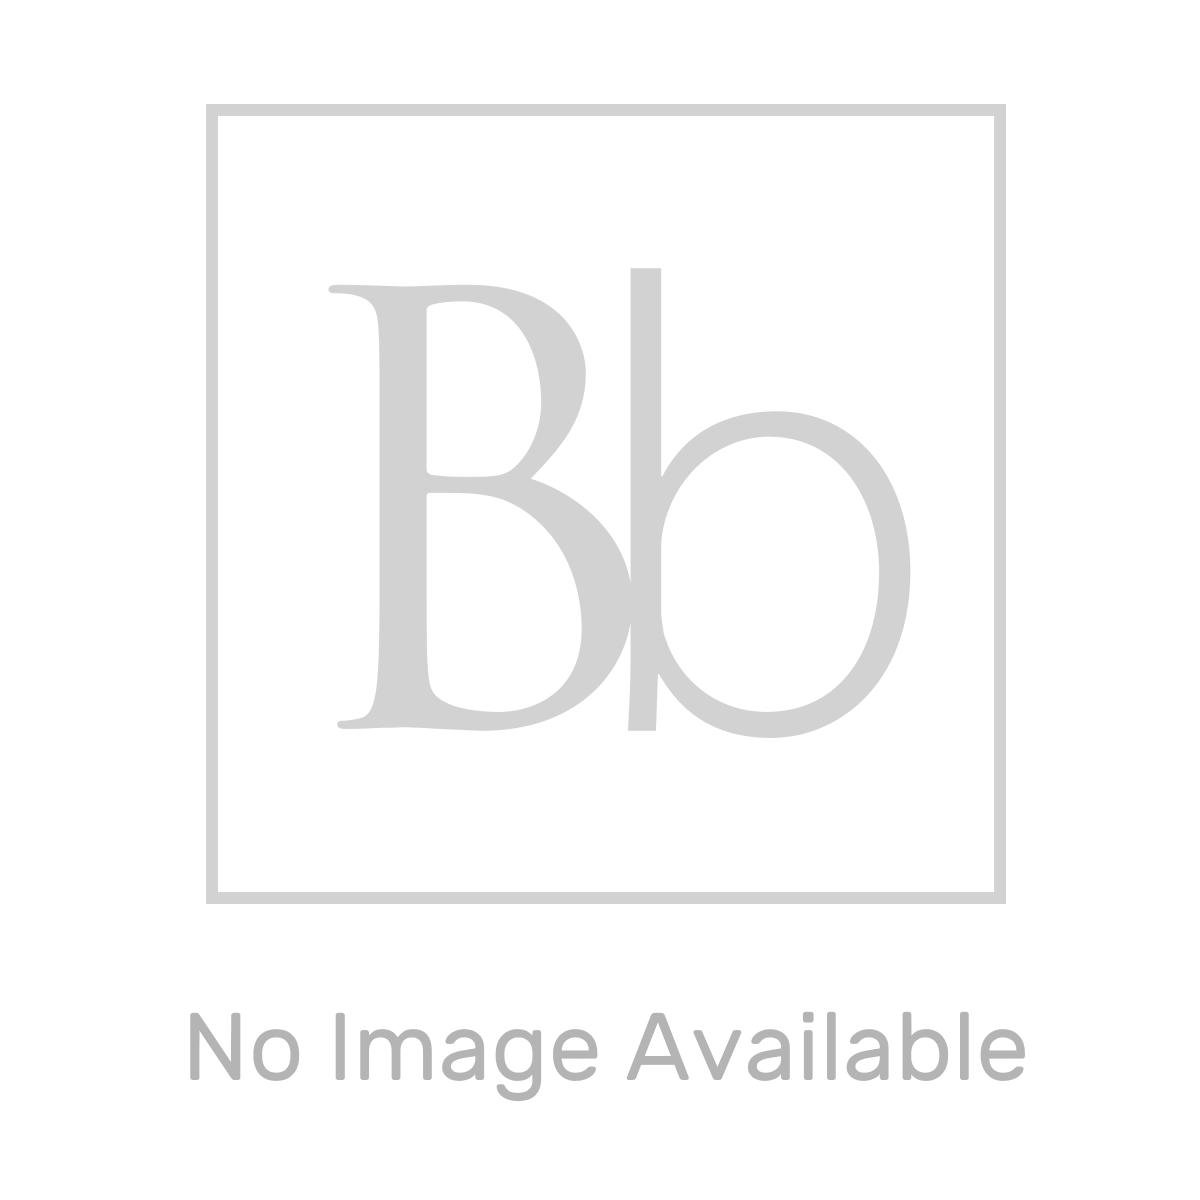 Nuie Athena Gloss Grey Mist 2 Door Floor Standing Vanity Unit with 40mm Profile Basin 500mm Line Drawing